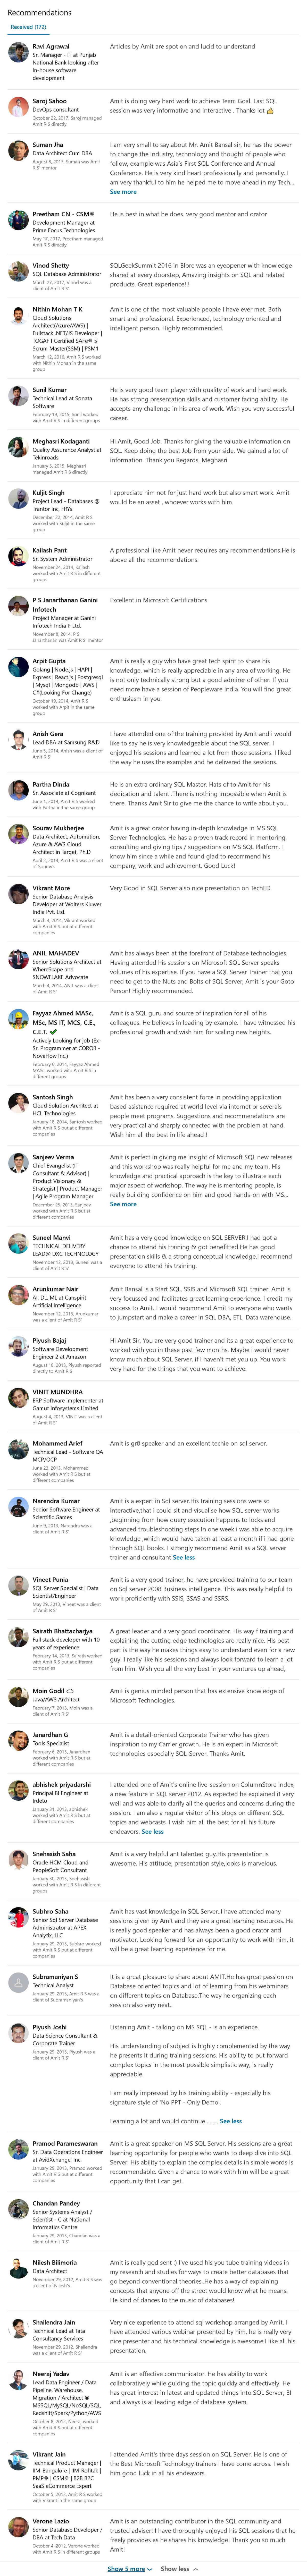 Amit Bansal SQL Server LinkedIn Recommenations